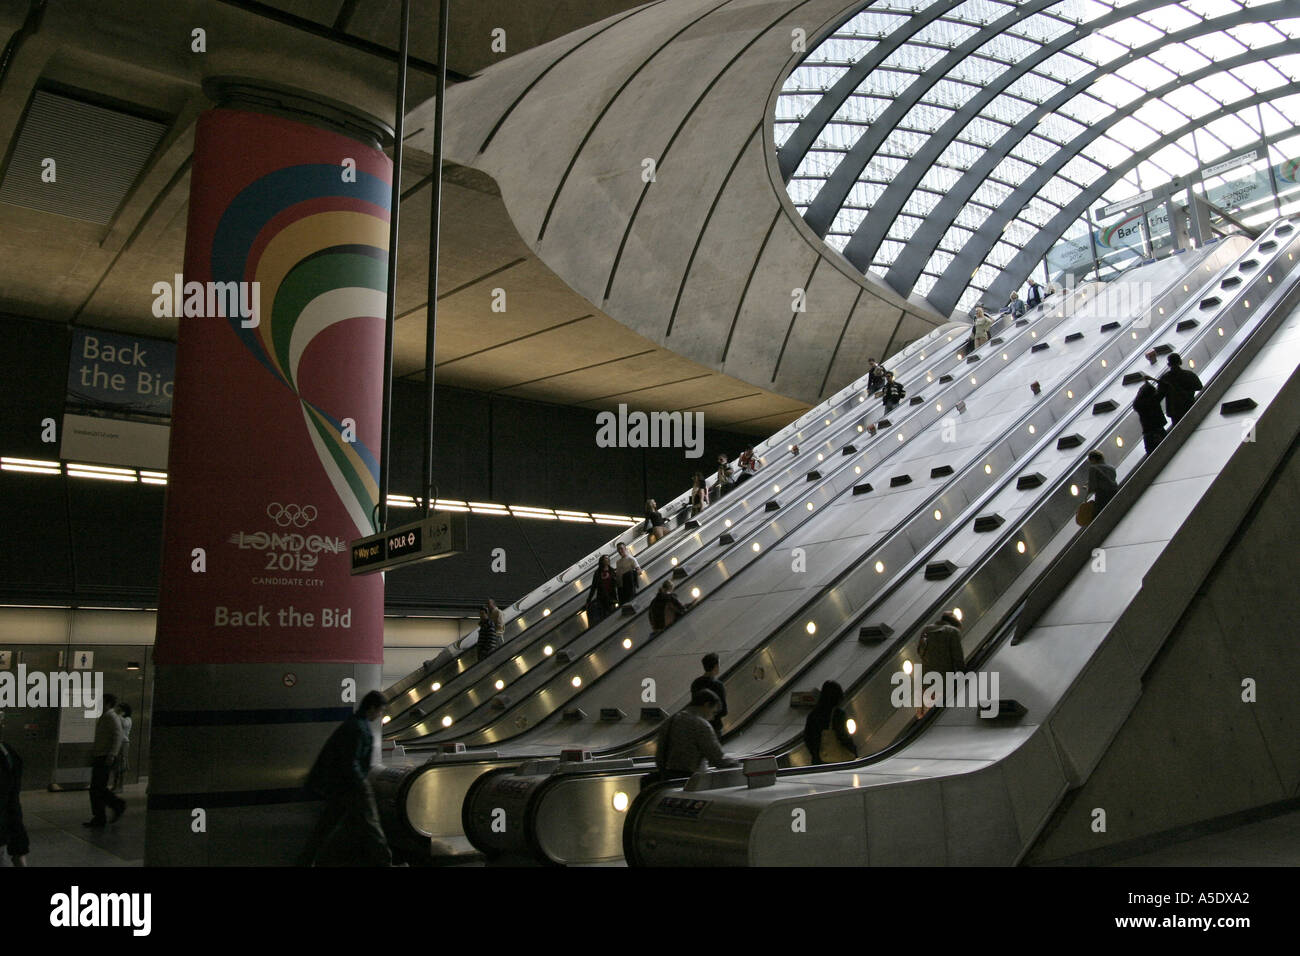 Canary Wharf tube underground station escalators in Docklands London England - Stock Image